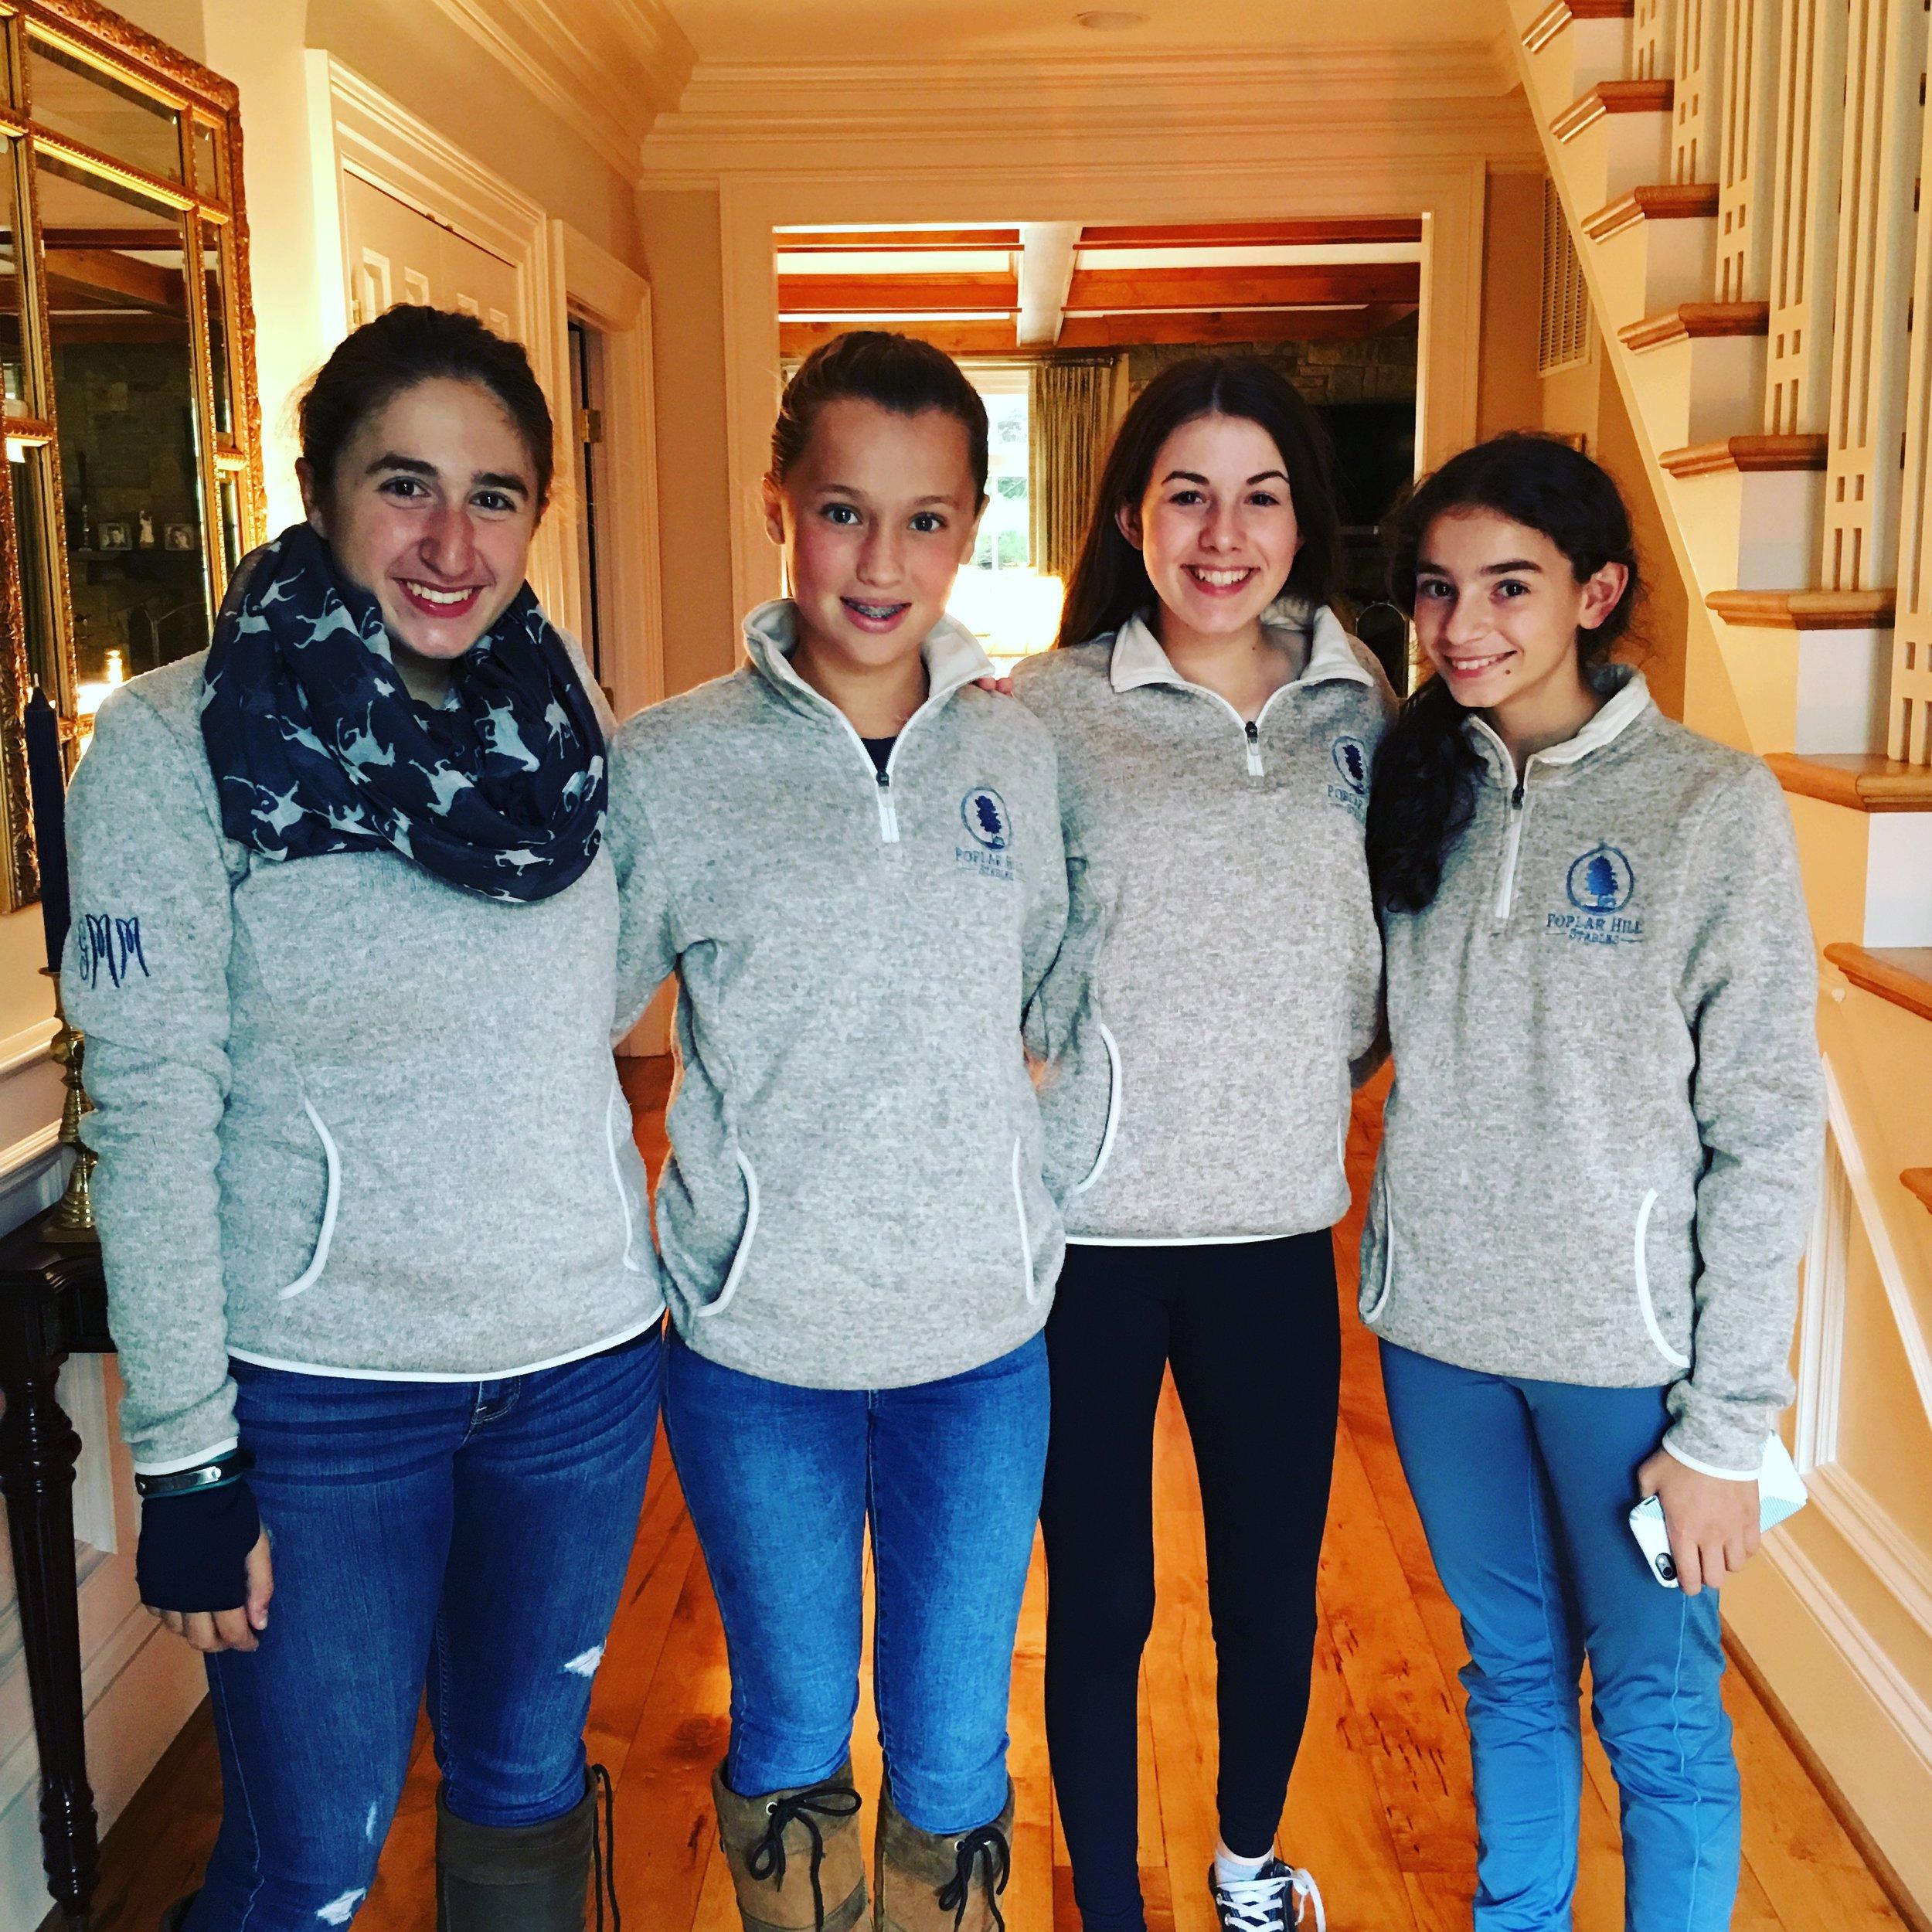 sweater group.JPG